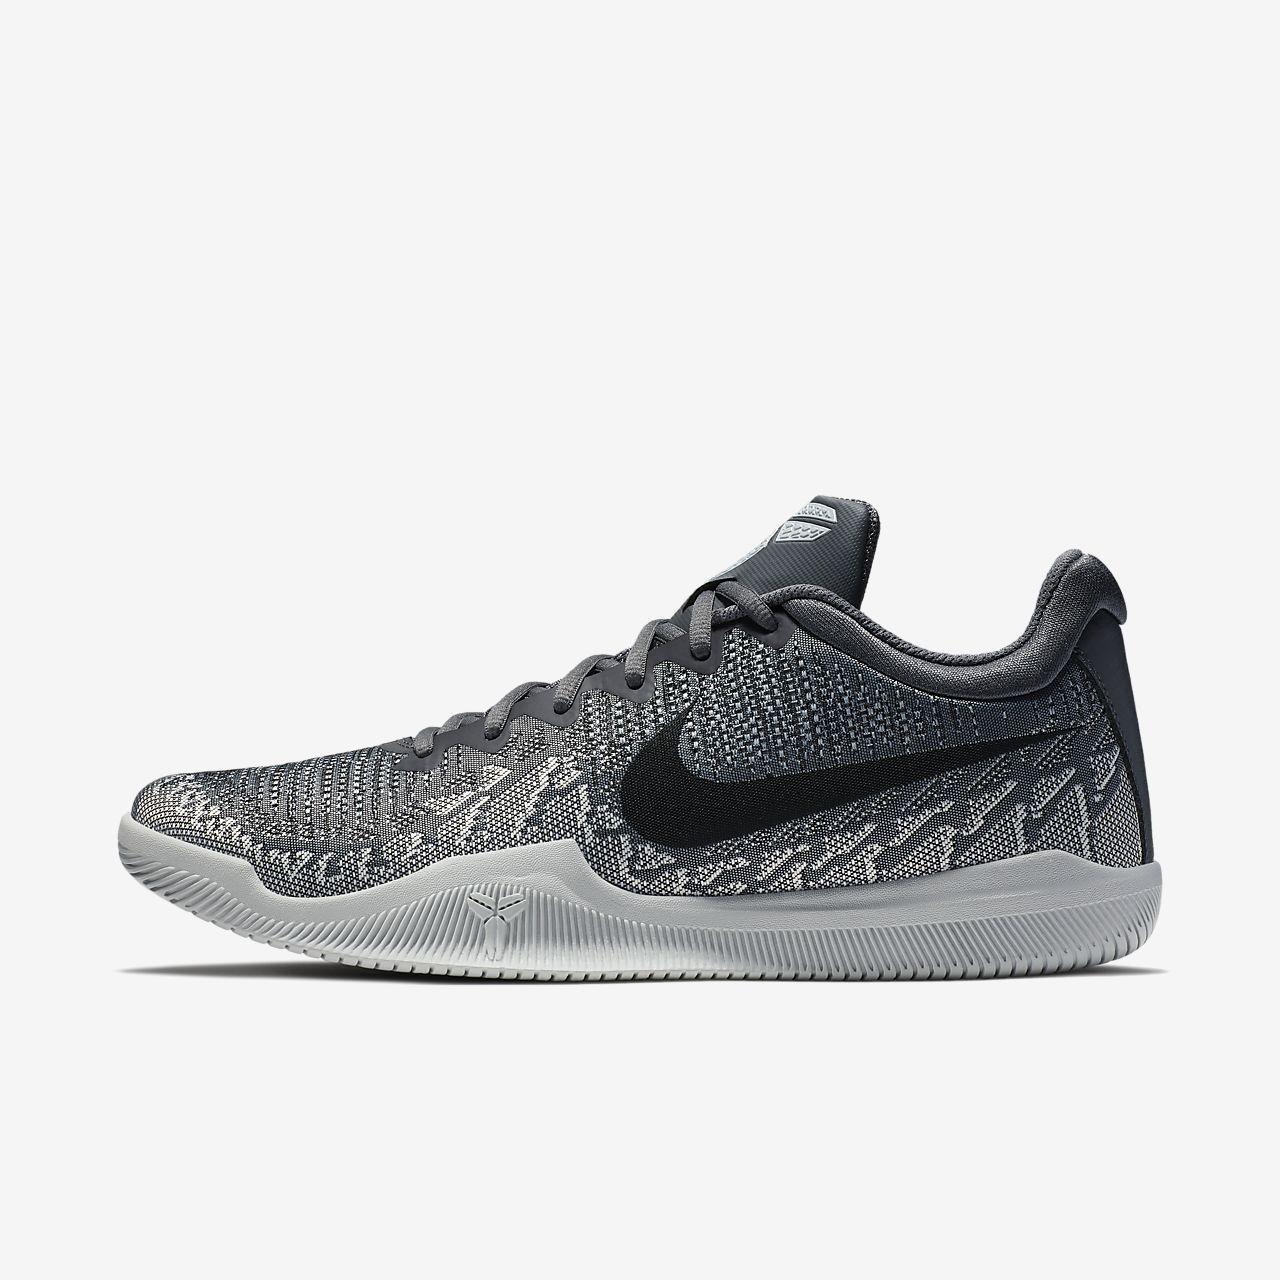 Nike Performance MAMBA RAGE - Basketball shoes - dark grey/black/pure platinum uUWCnYDkz